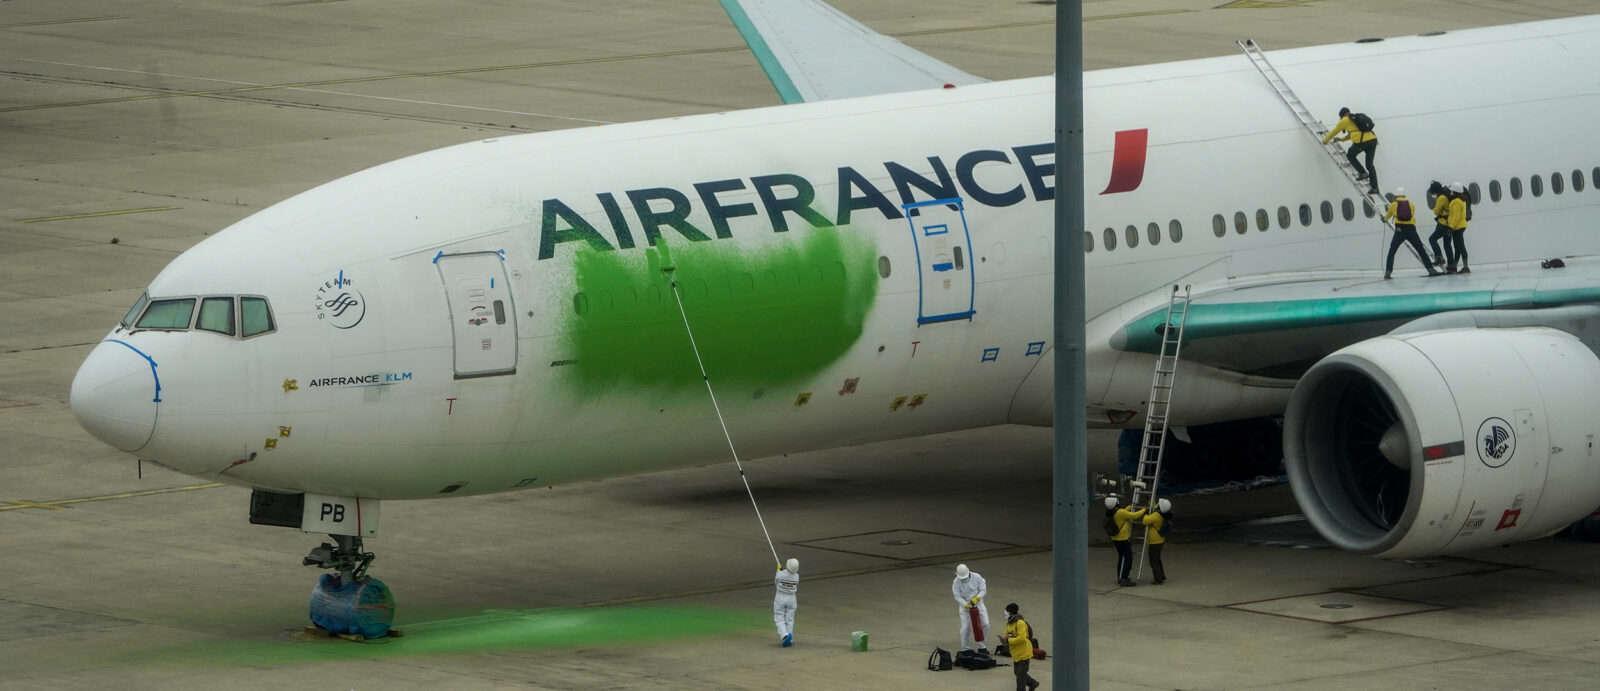 Greenpeace Vandalize Air France 777 Parked For A Year - Mentour Pilot